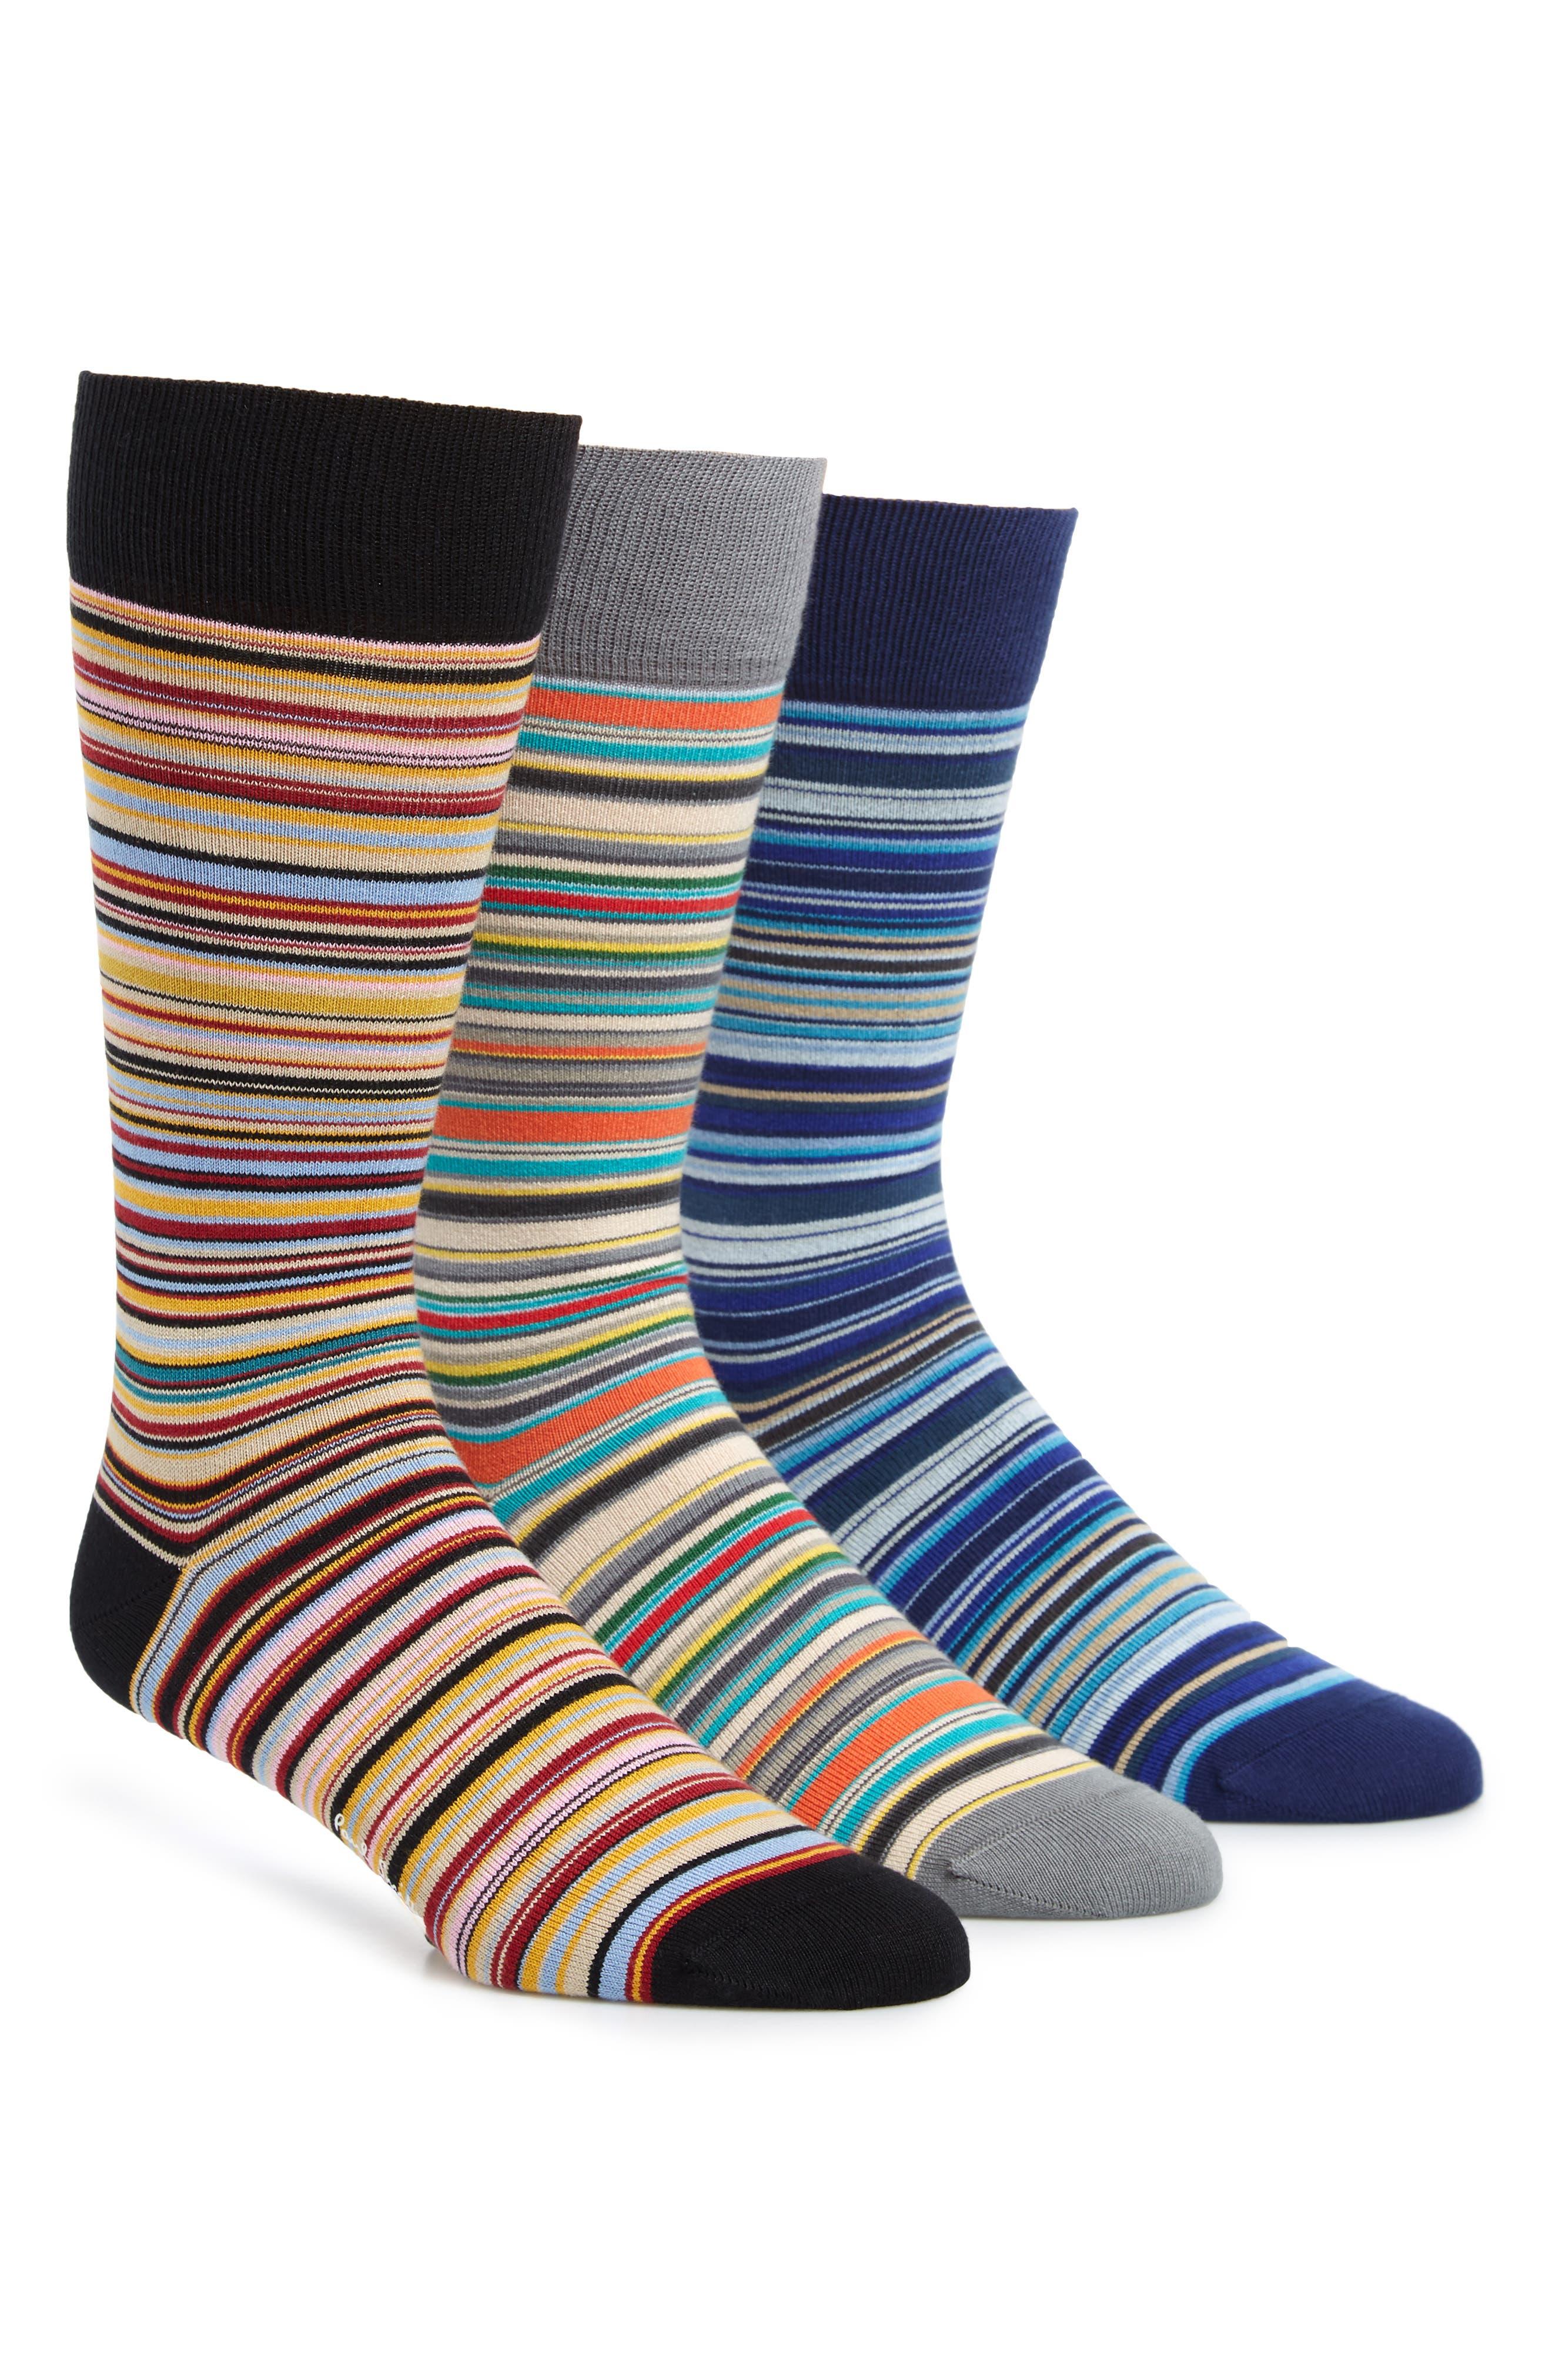 3-Pack Stripe Socks,                             Main thumbnail 1, color,                             RED/ BLUE MULTI